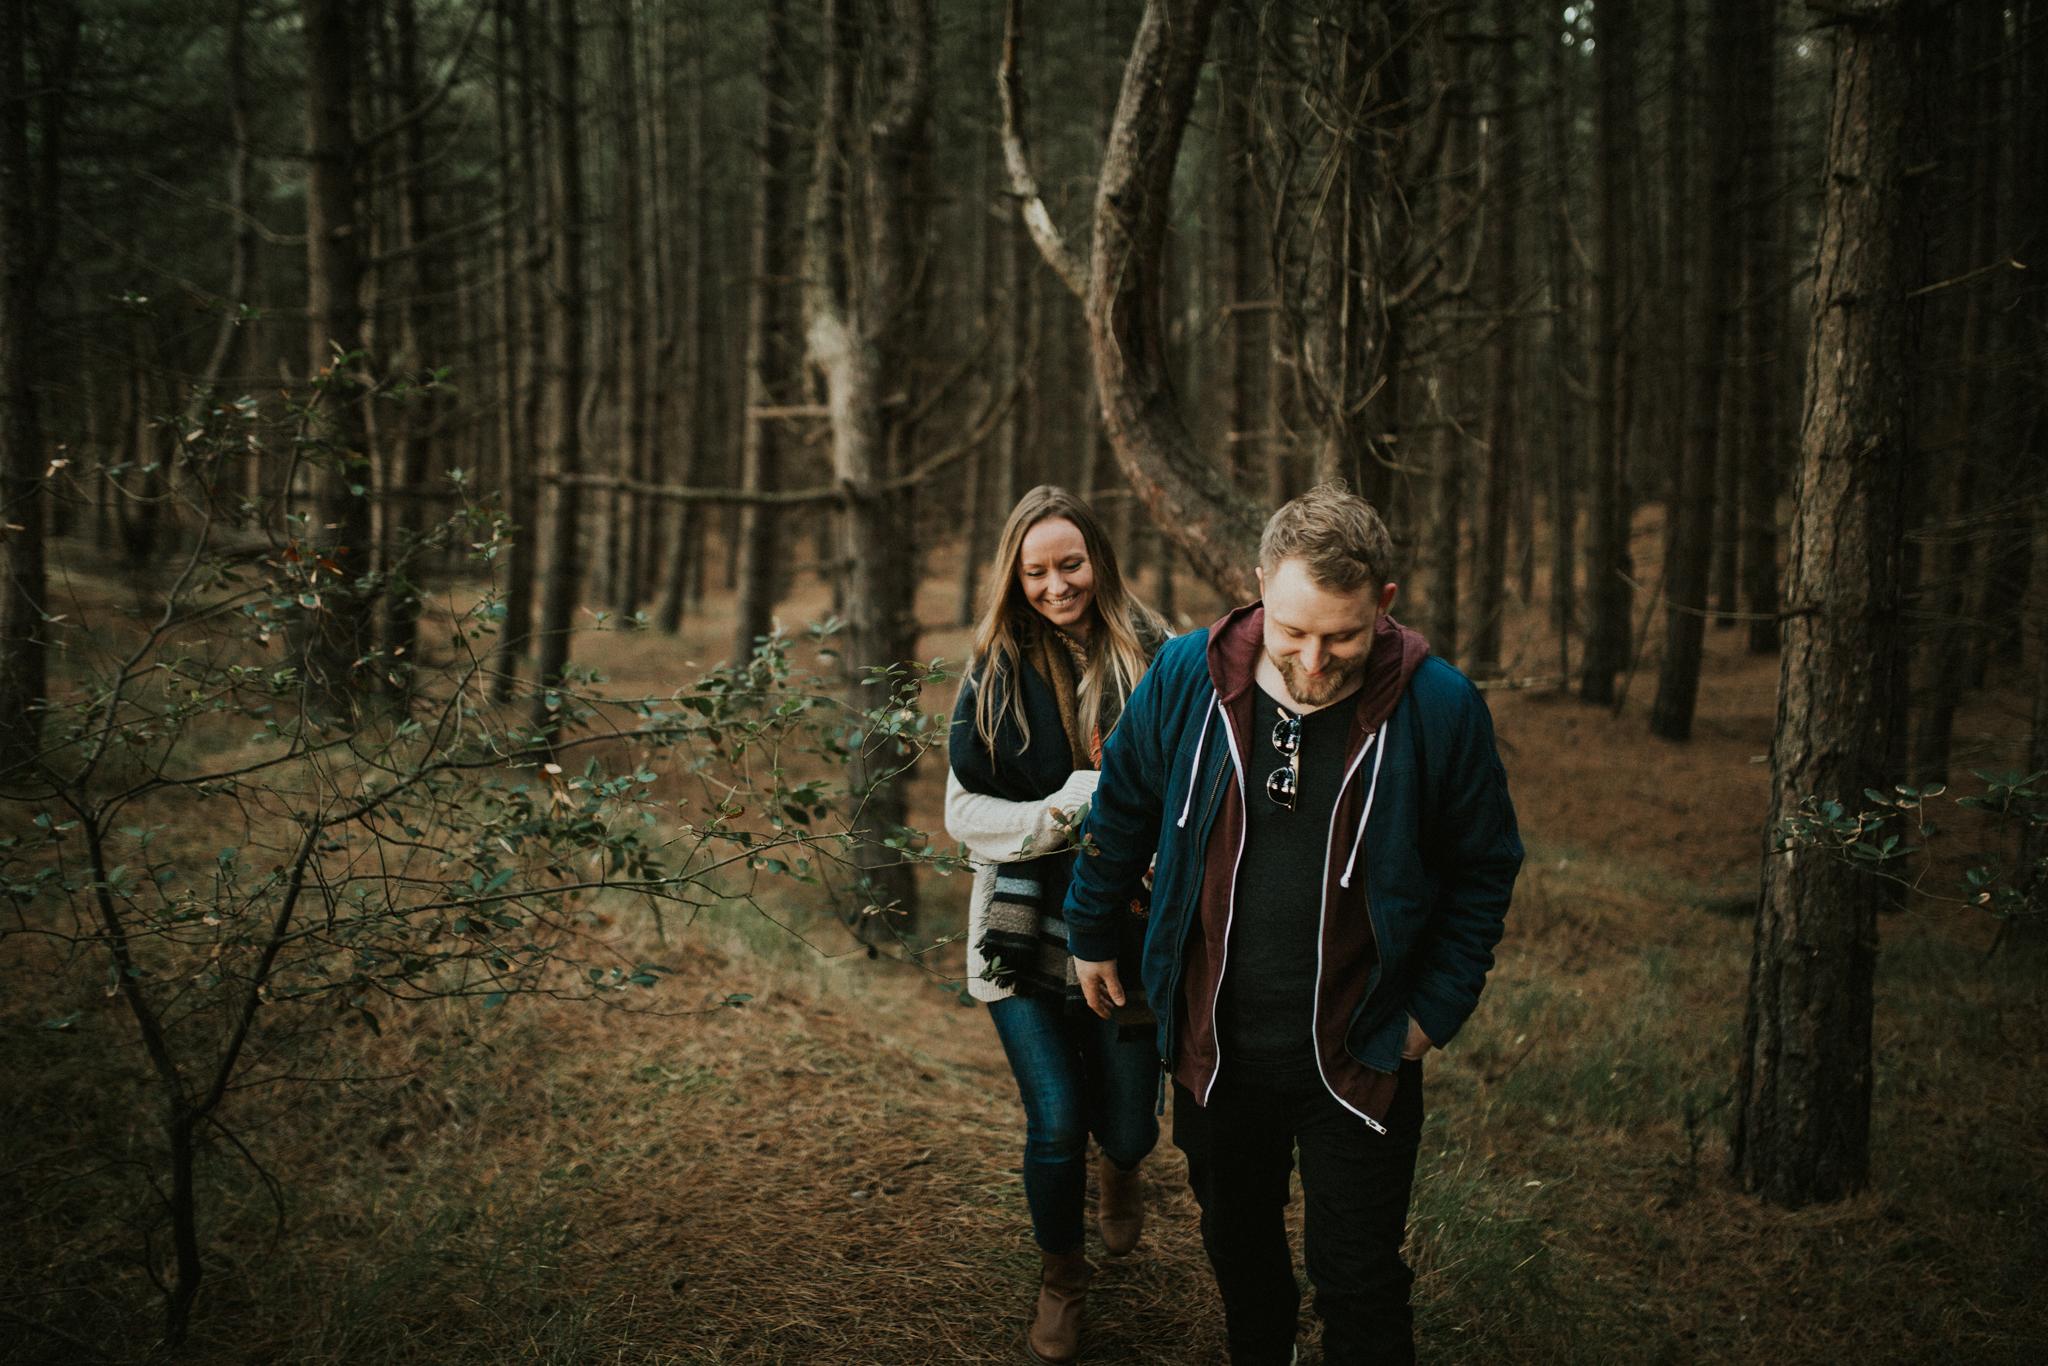 Luke-Mary-Engagement-Adventure-Session-Norfolk-Photography-Photographer-Darina-Stoda-19.jpg